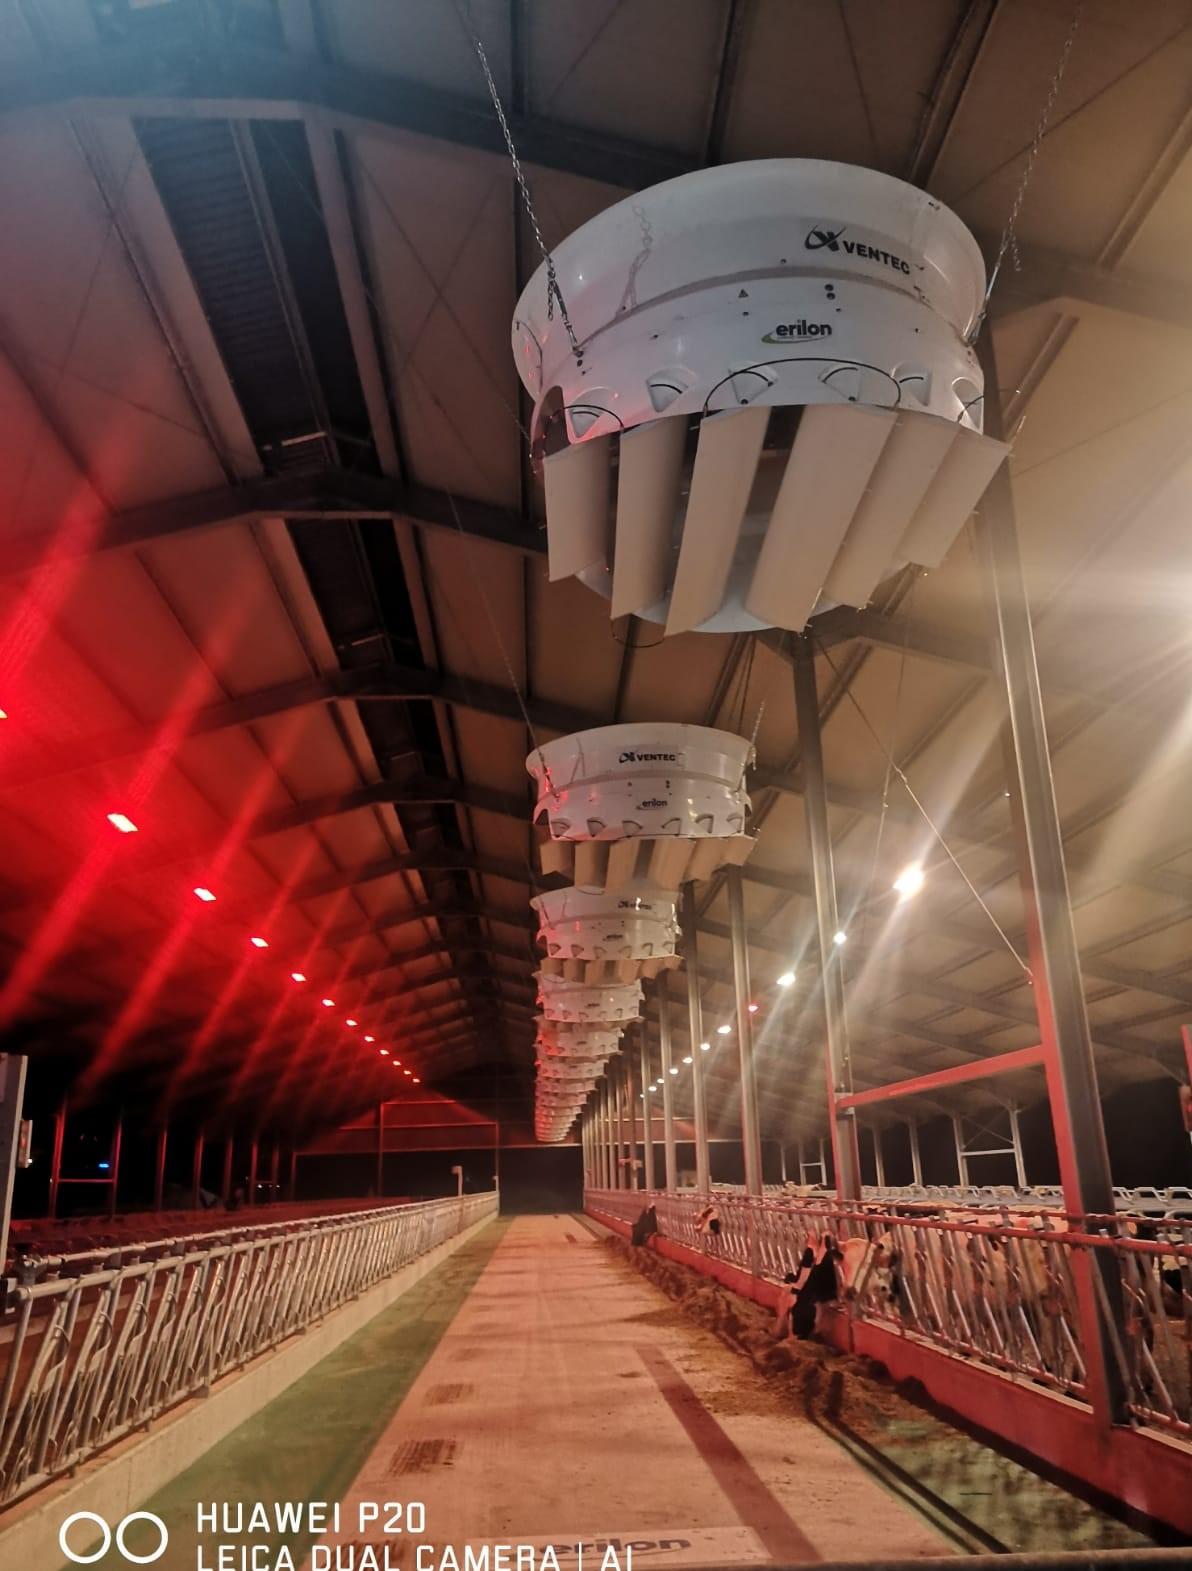 cavalli-illuminazione2.jpeg